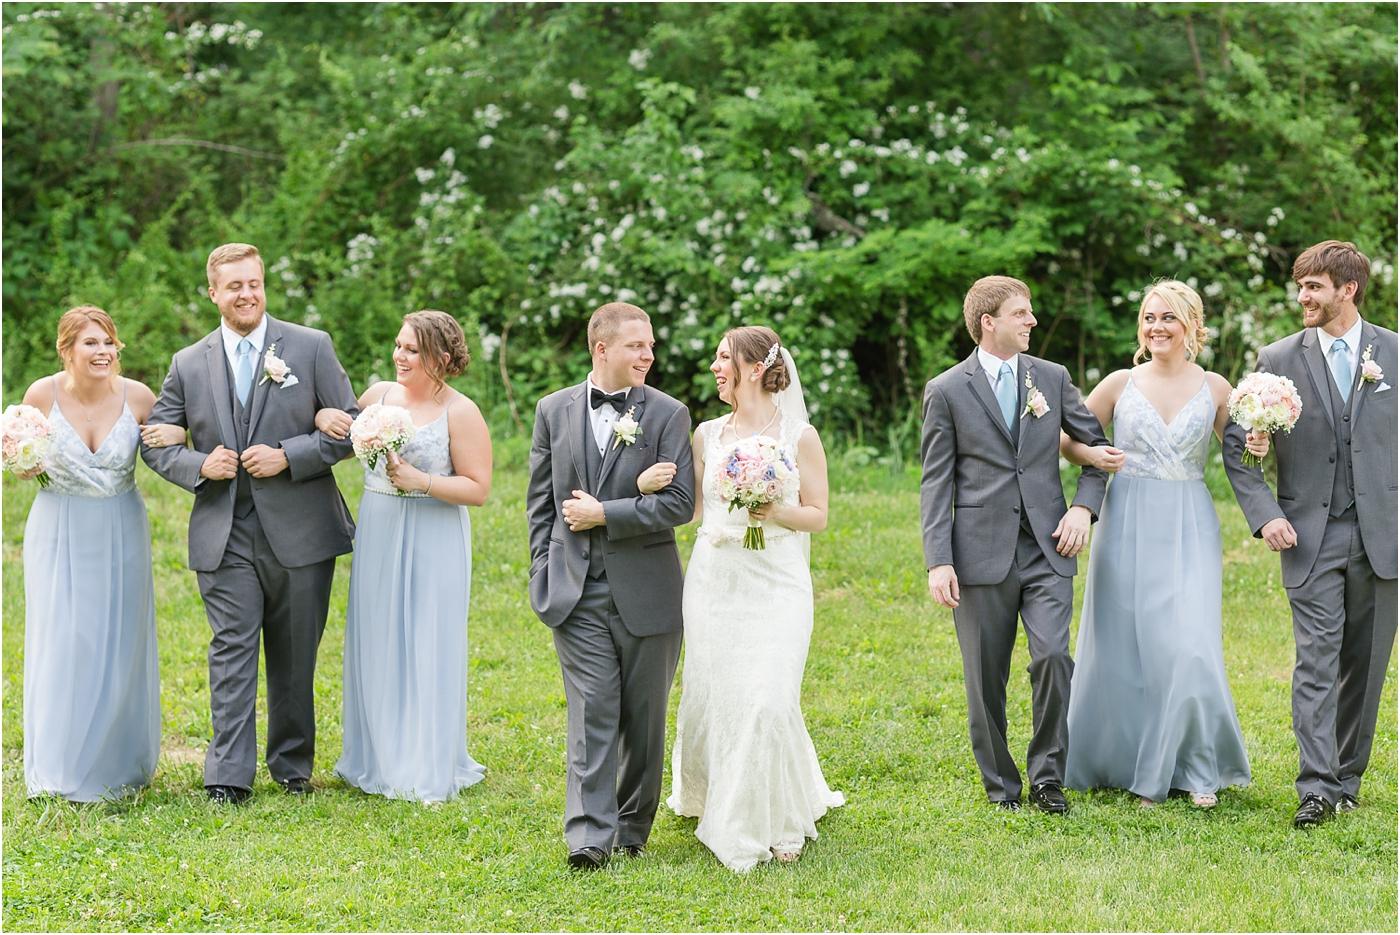 Gettysburg-lodges-wedding-photos-64.jpg